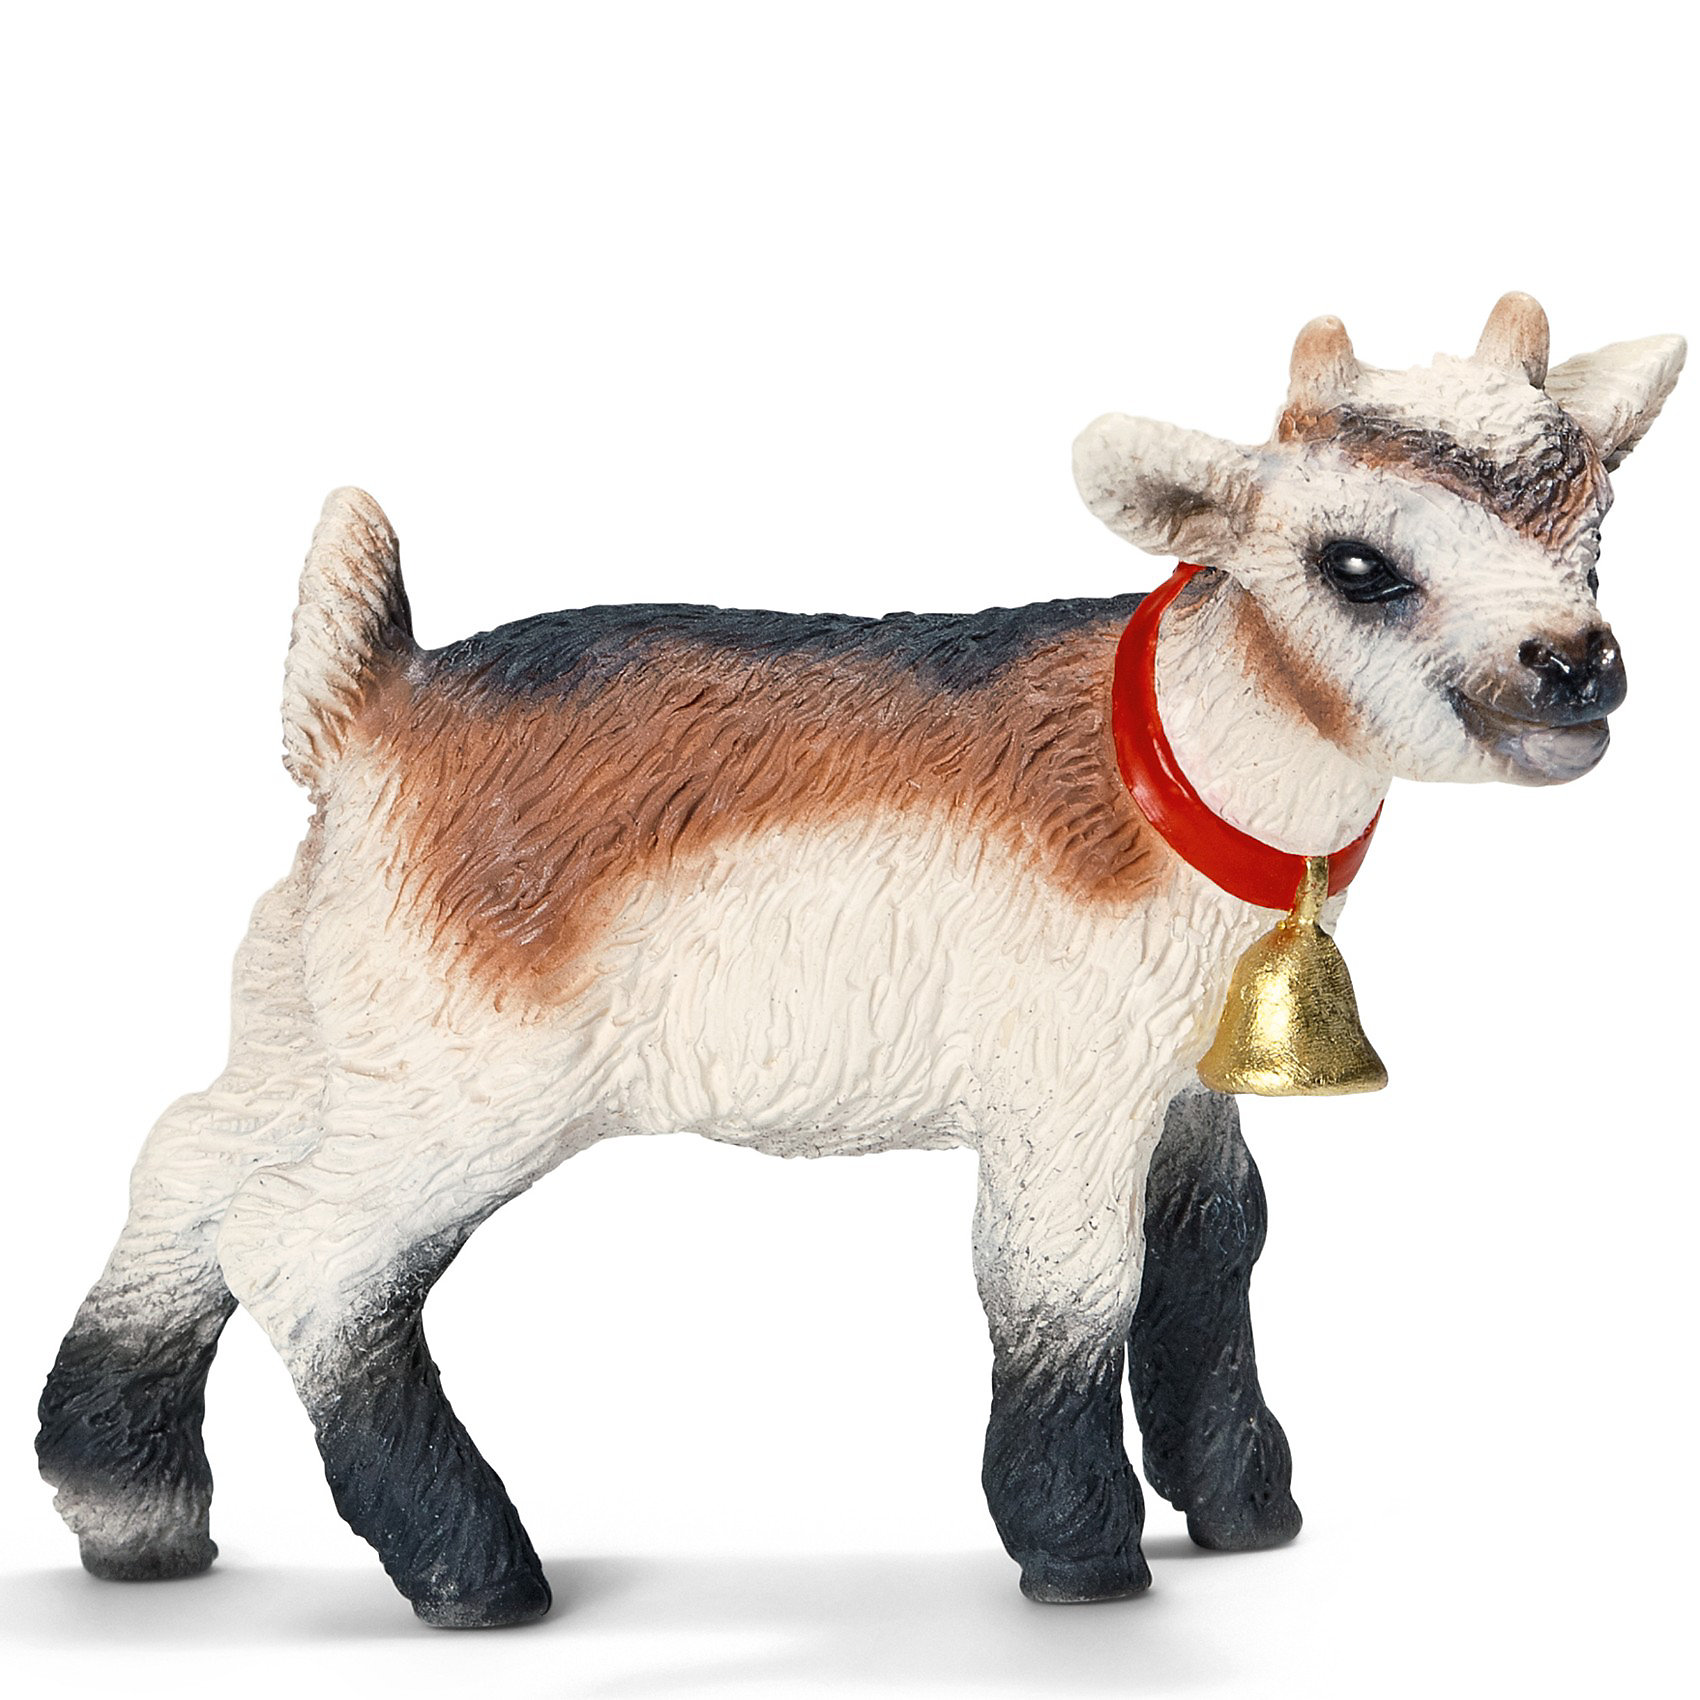 Schleich Домашняя коза, детеныш. Серия Ферма